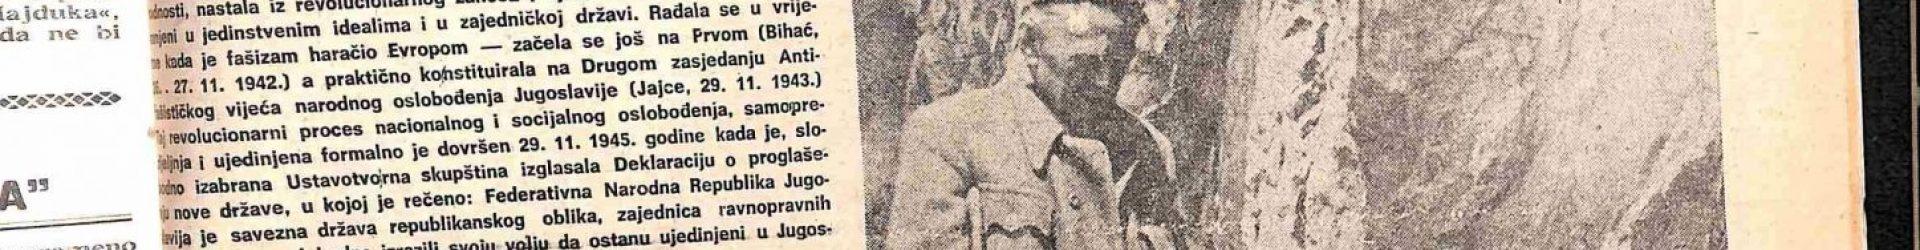 28 studeni 1981_Page_1